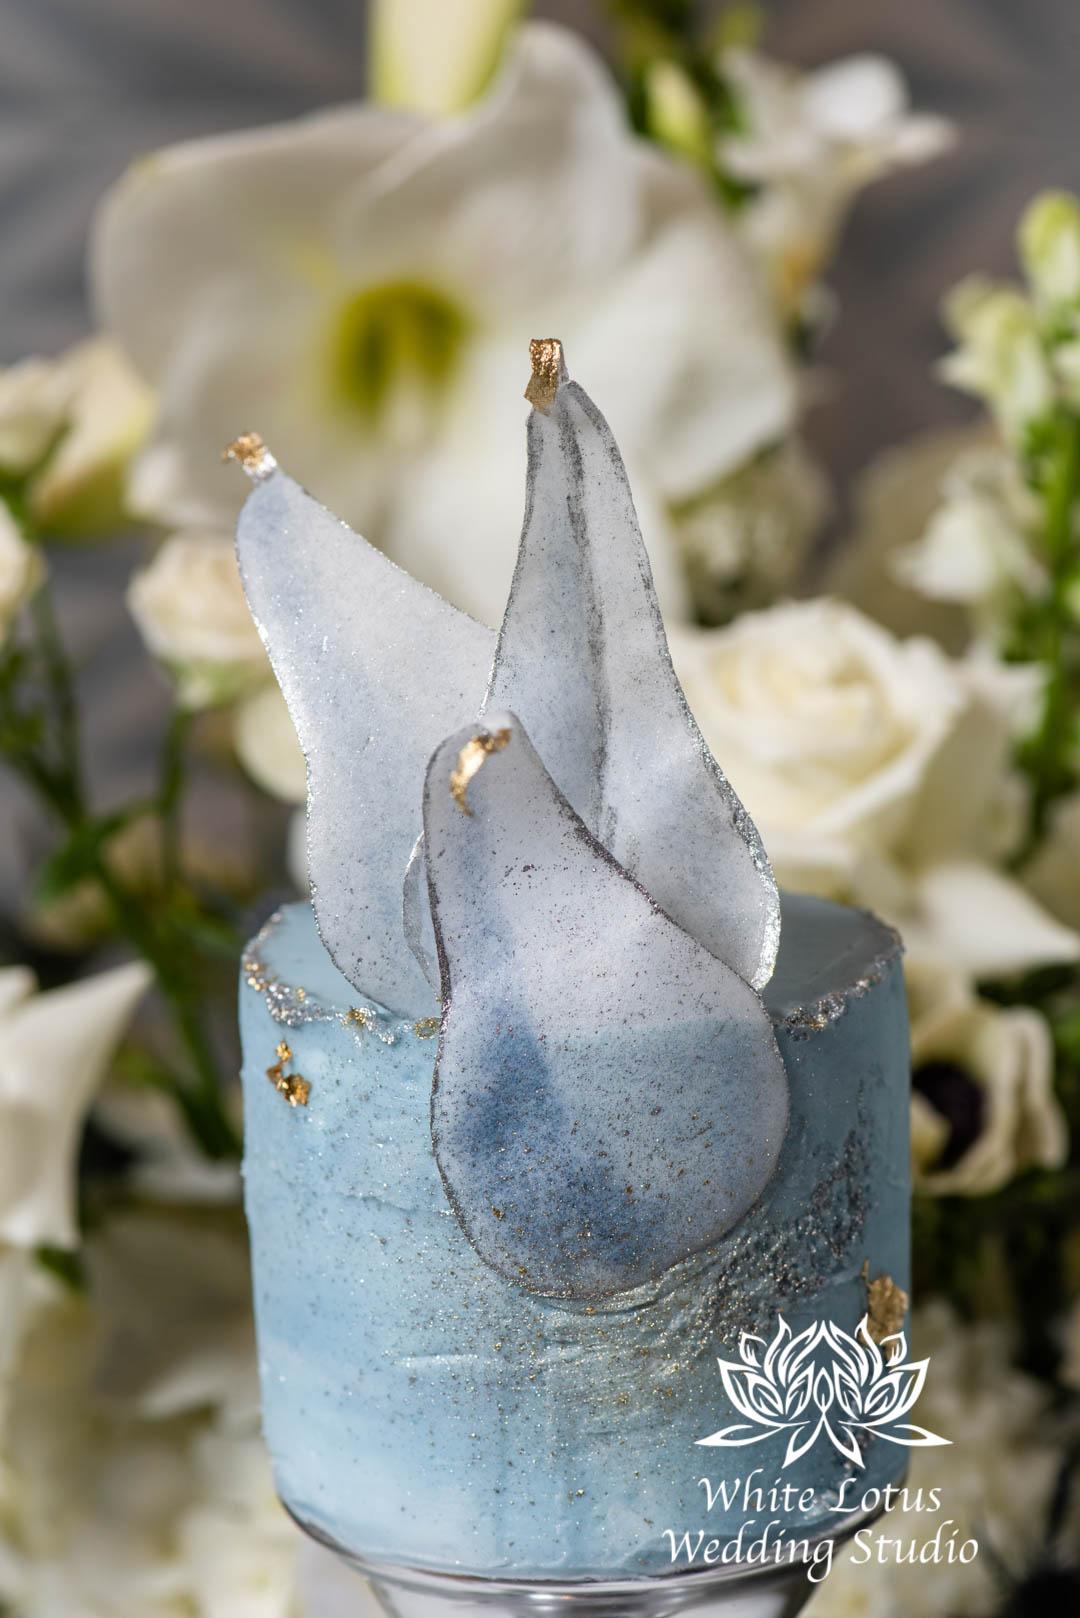 107- GLAM WINTERLUXE WEDDING INSPIRATION